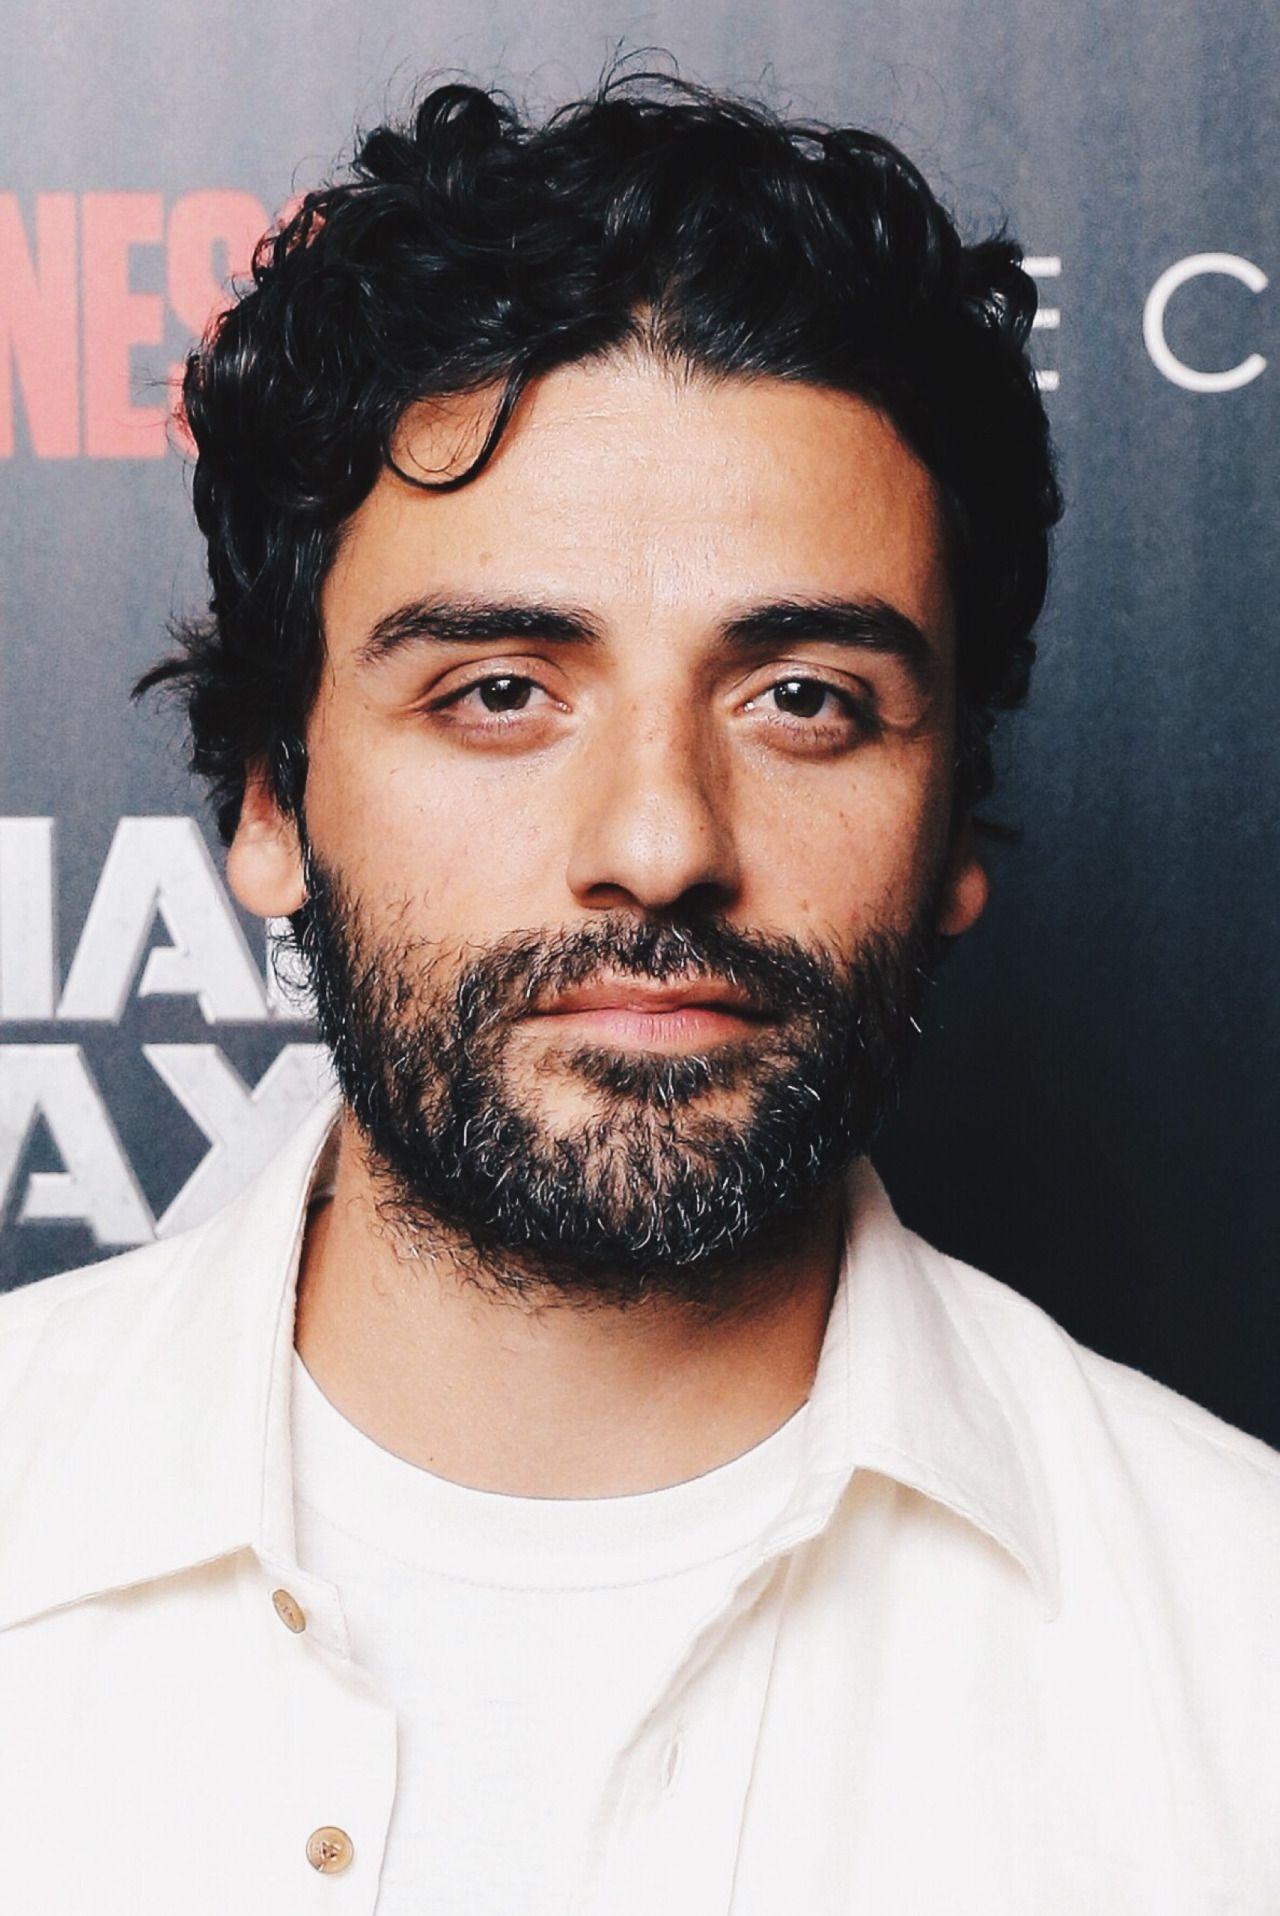 oscar isaac | Tumblr | Guys in 2019 | Oscar isaac, Actor